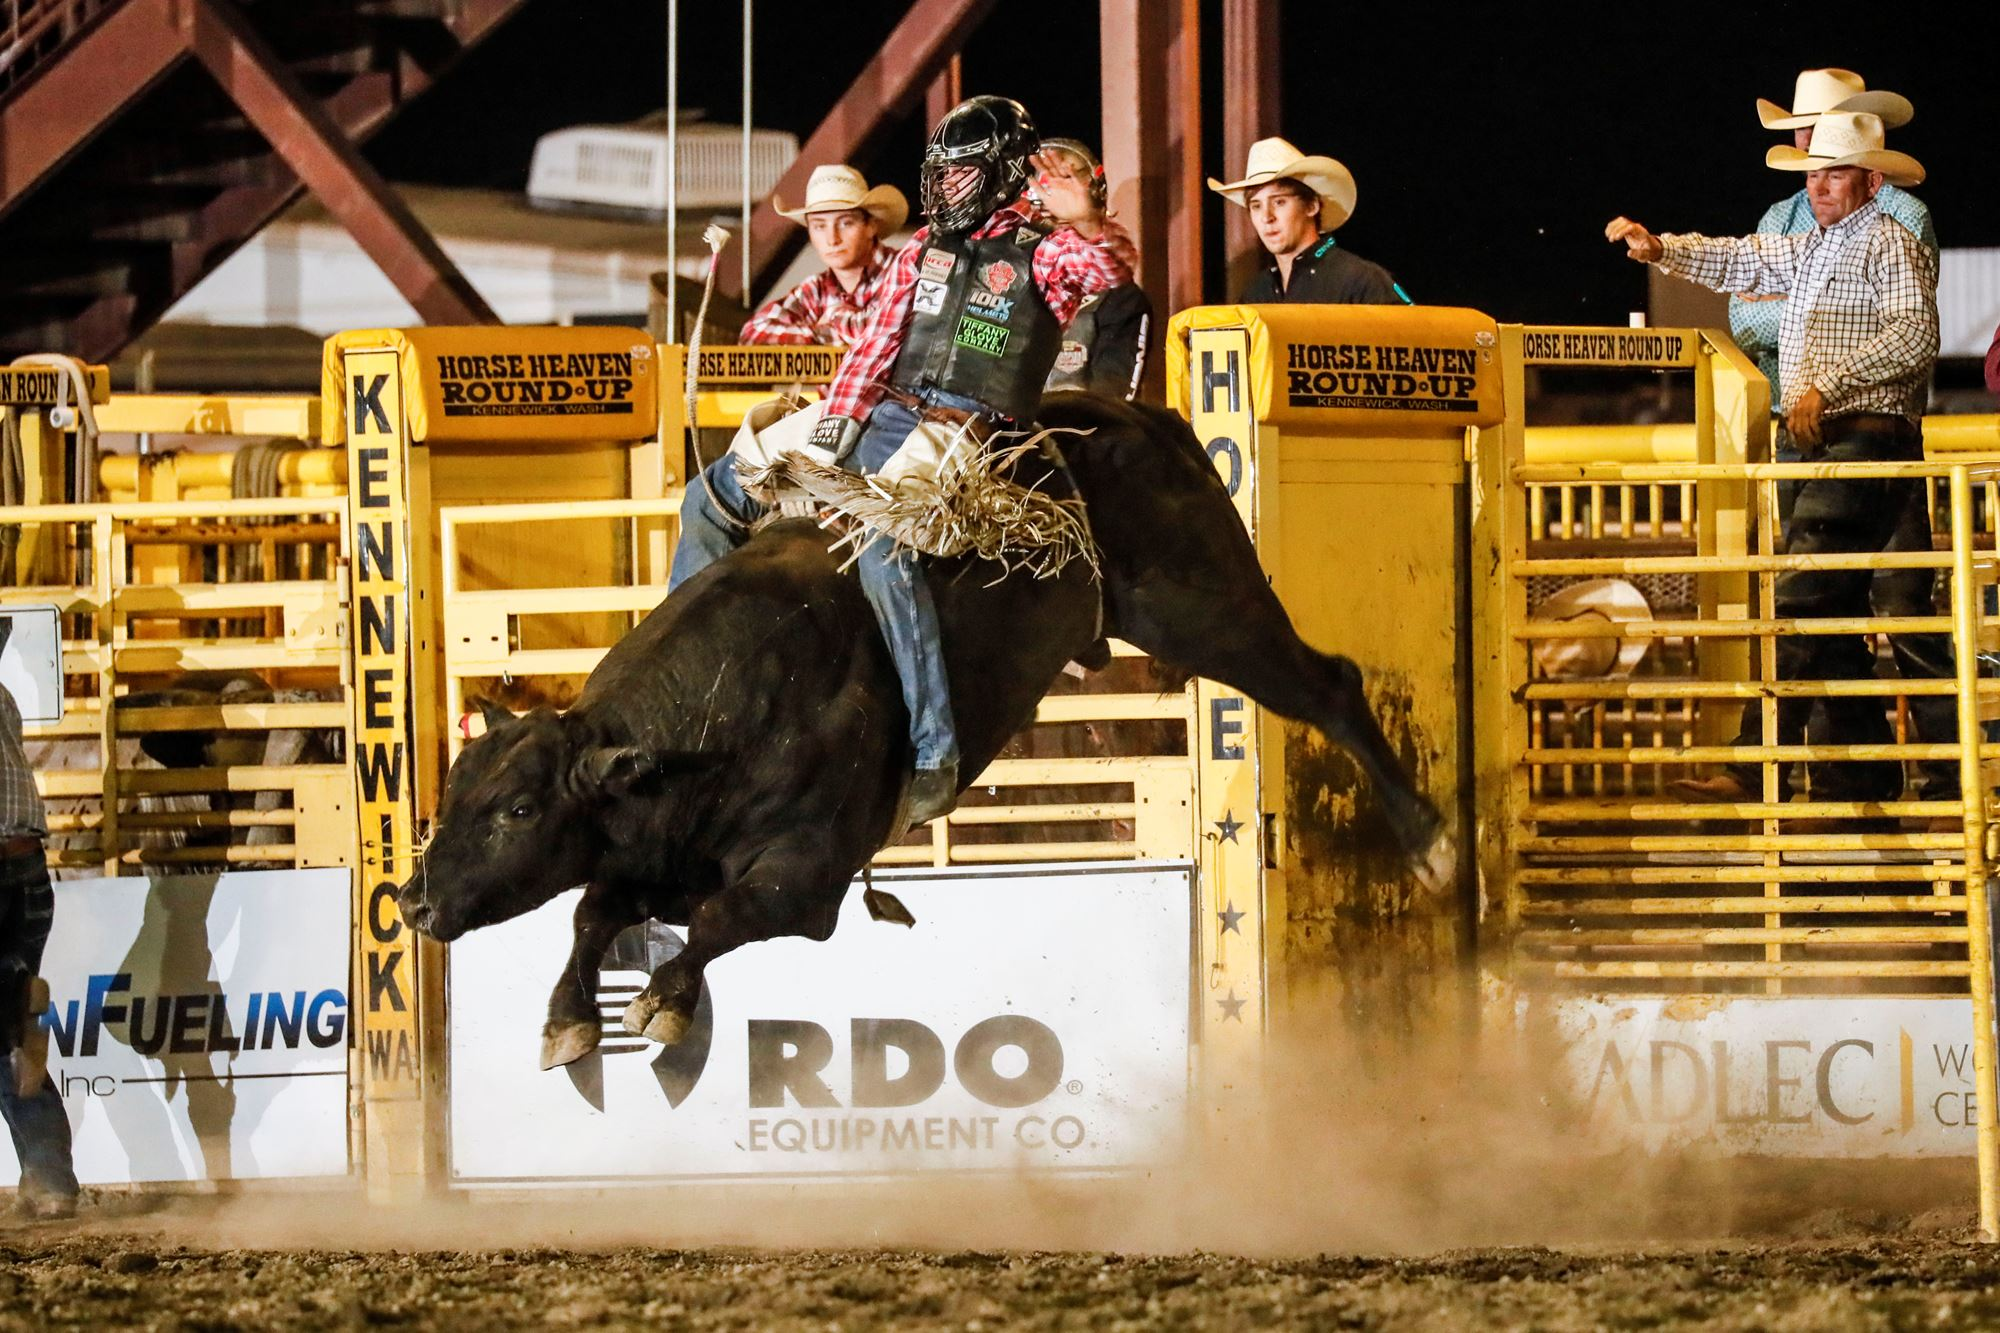 Eli Vastbinder riding Bull Rewind